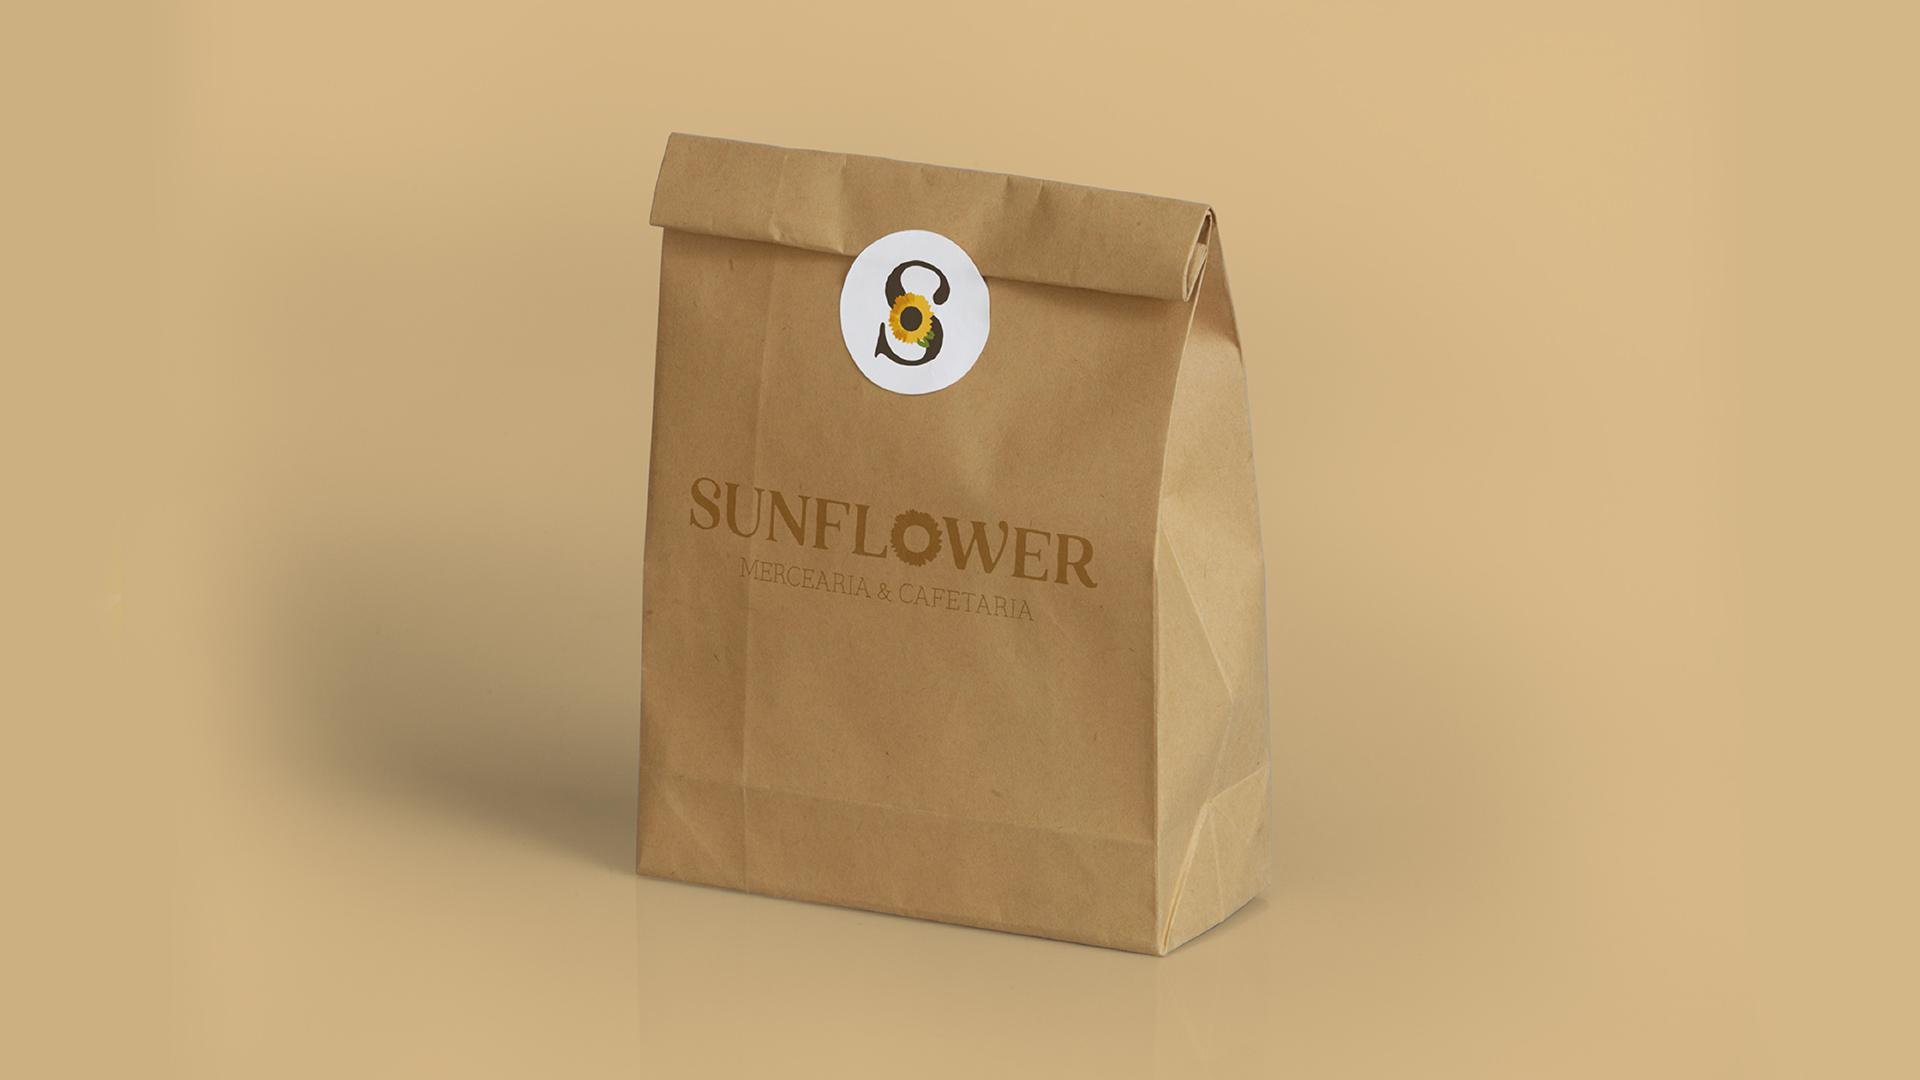 Wellness Brand Design paper bag for SUNFLOWER grocery store